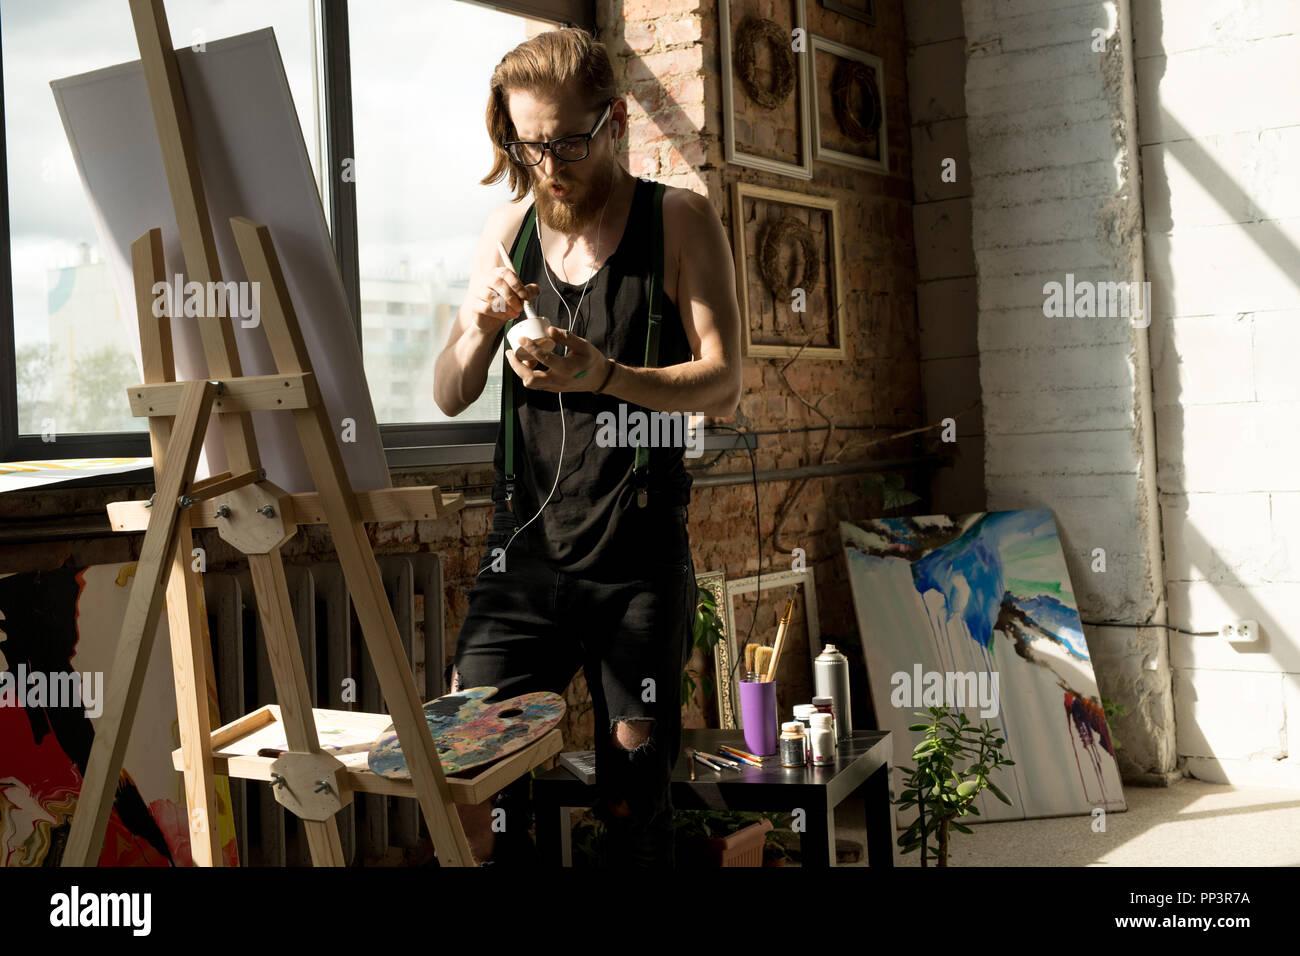 Atelier de l'artiste moderne Photo Stock